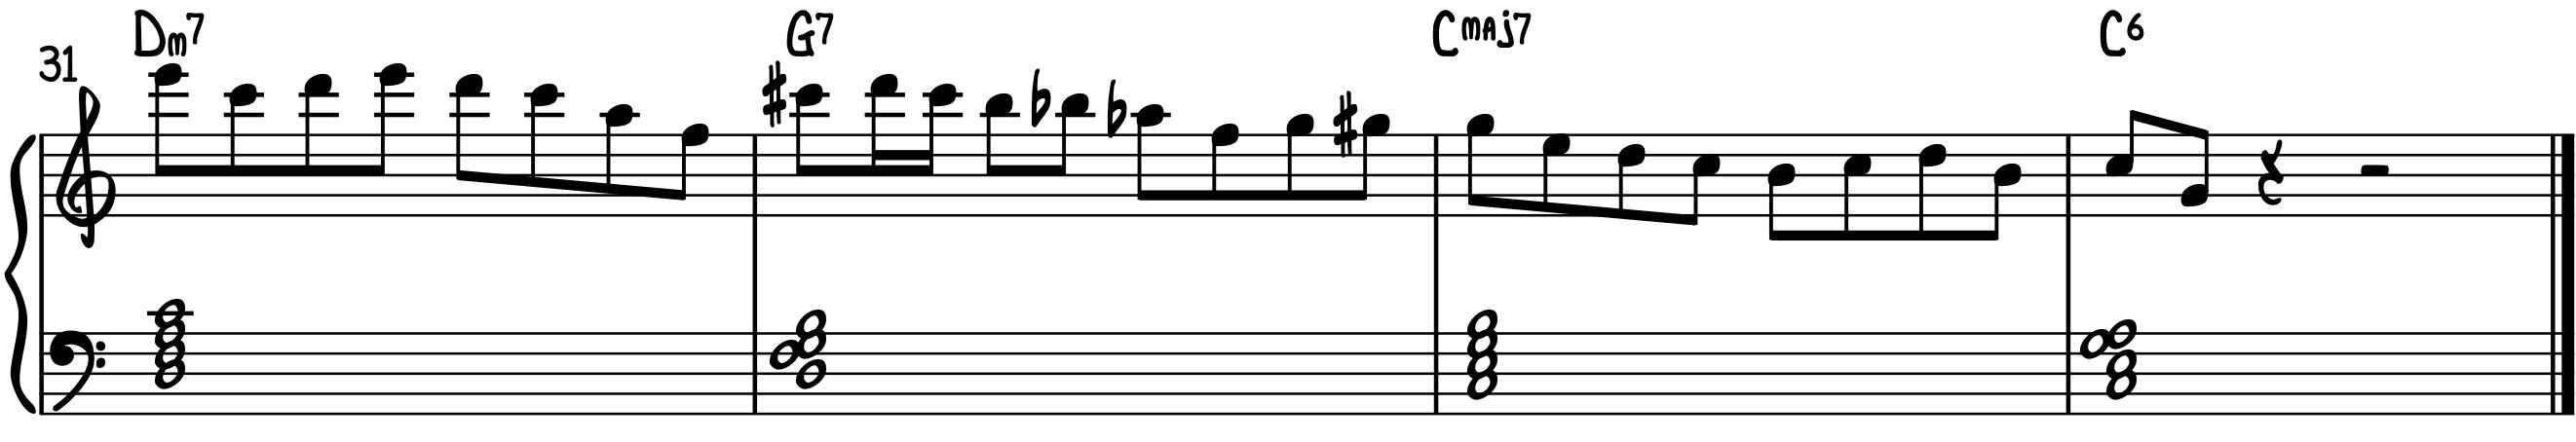 Improv Example 3